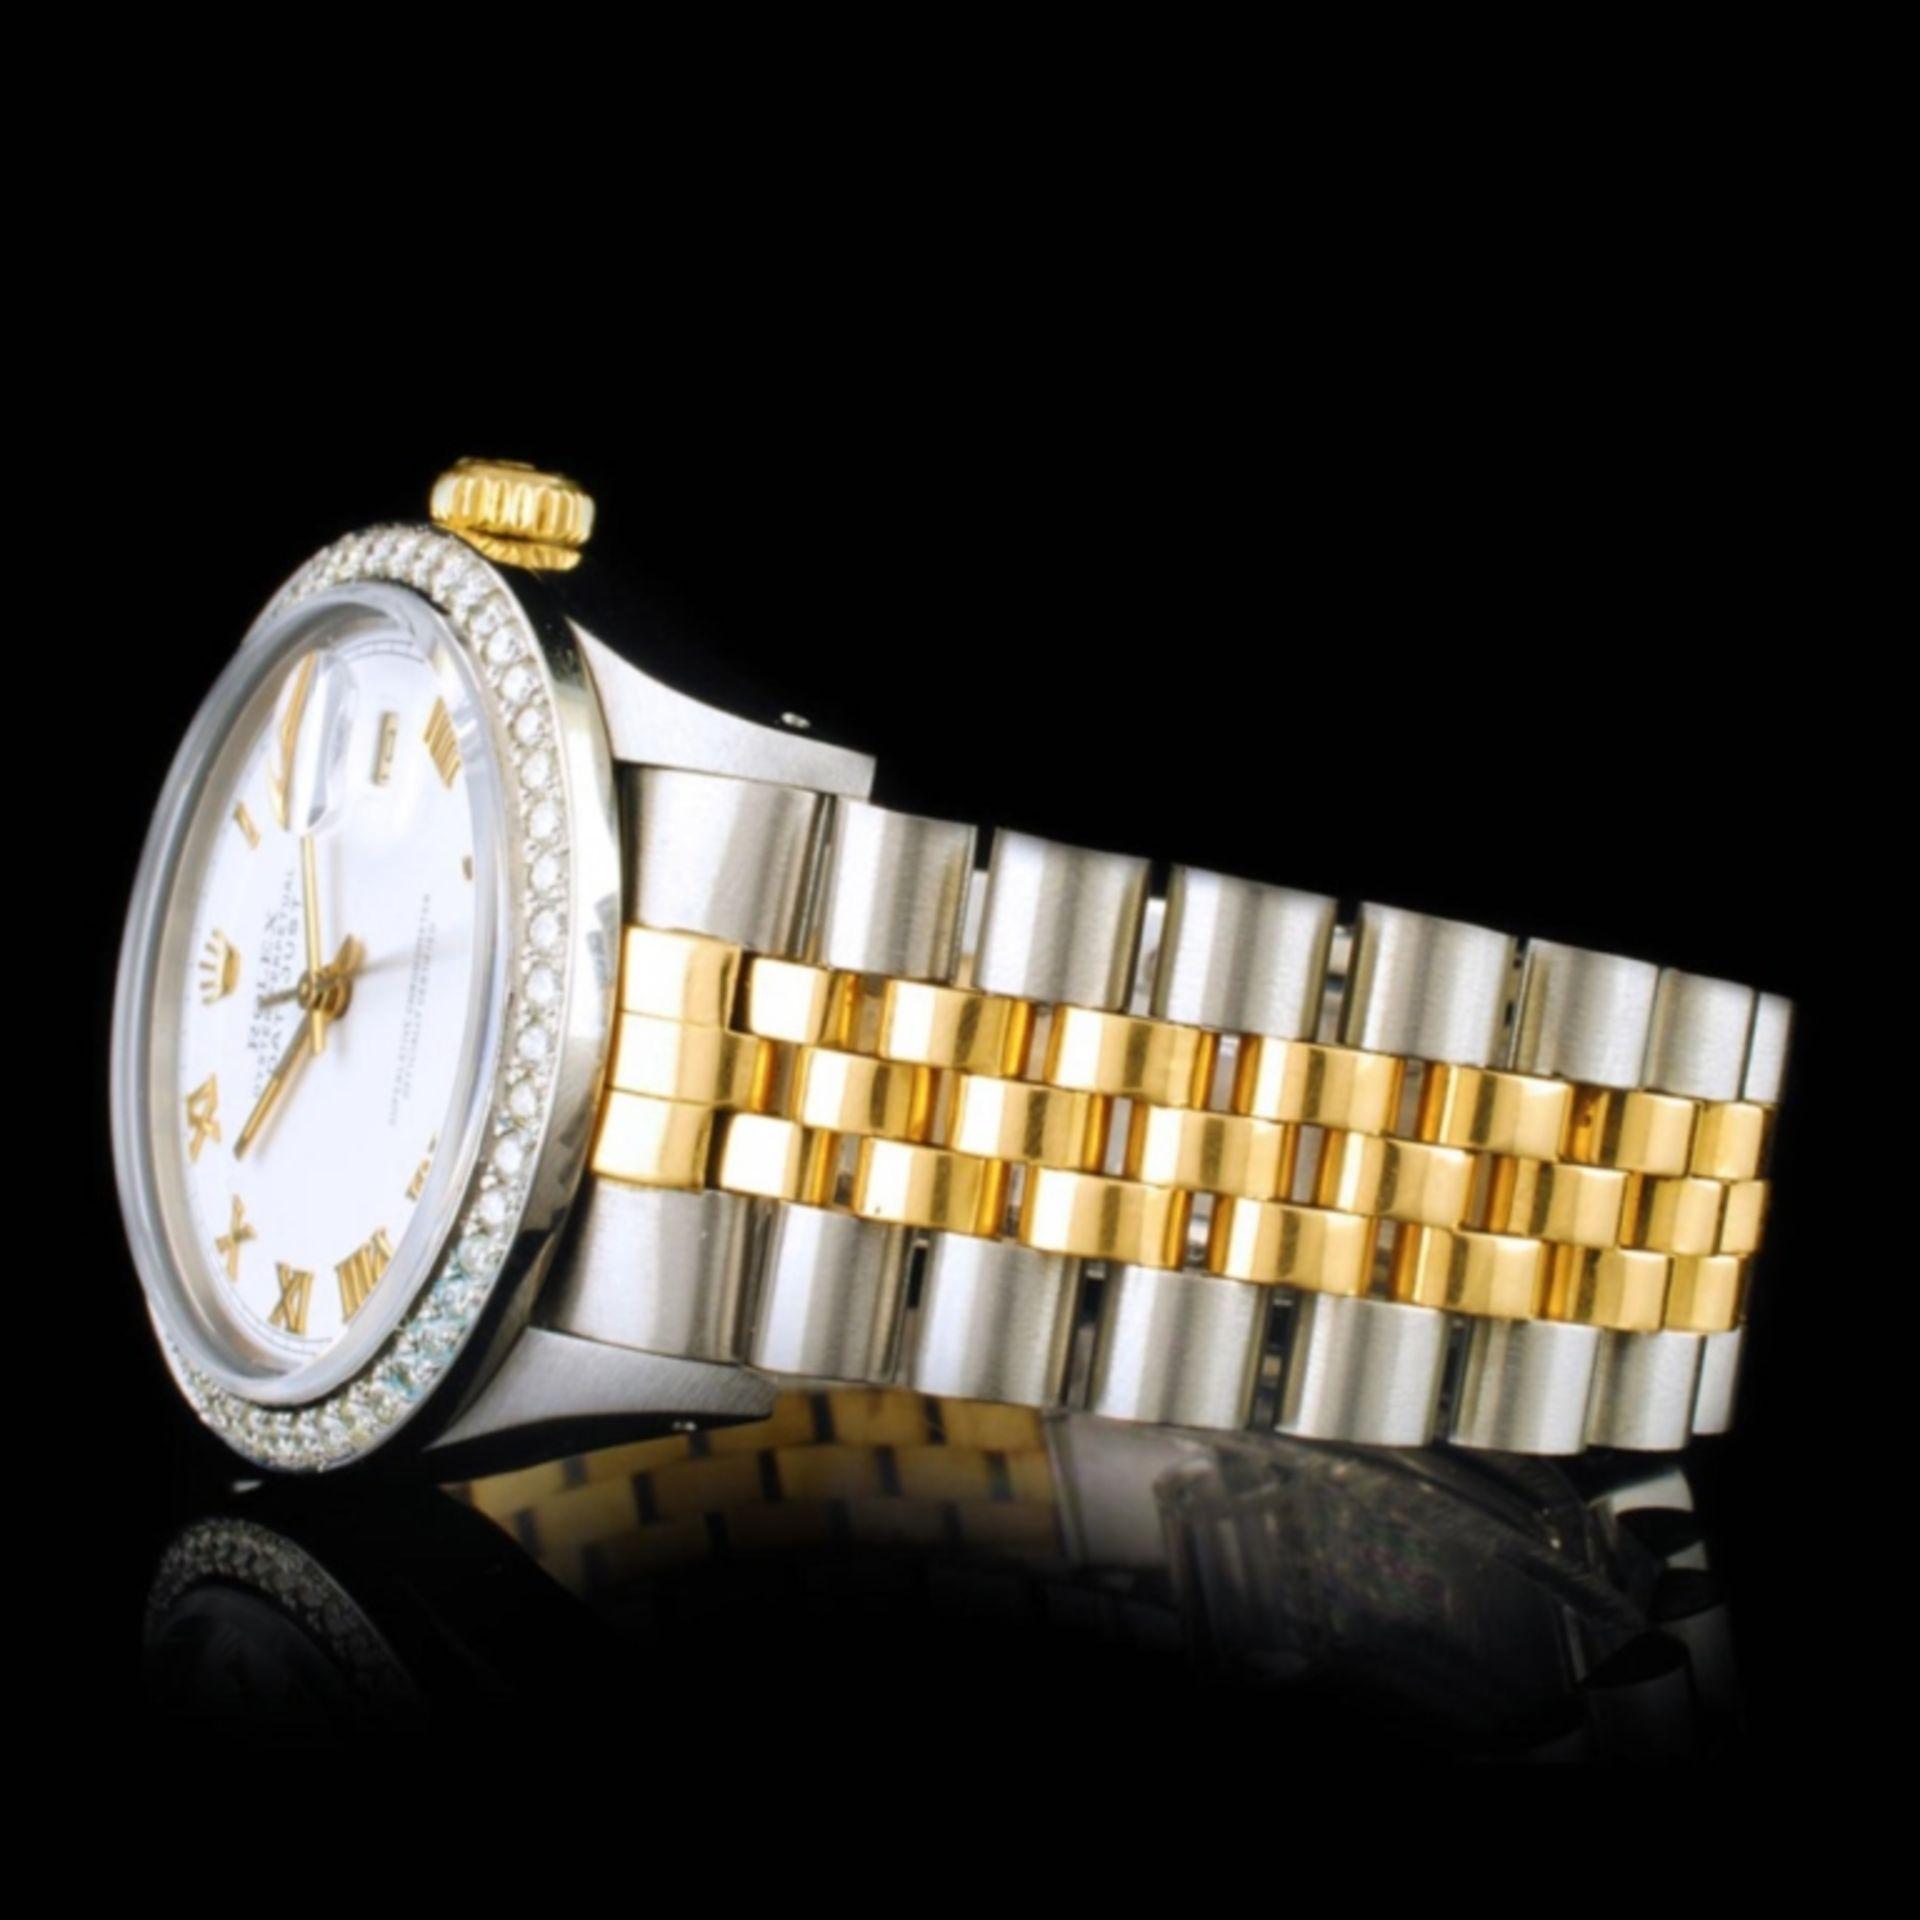 Rolex DateJust YG/SS Diamond 36mm Wristwatch - Image 4 of 6